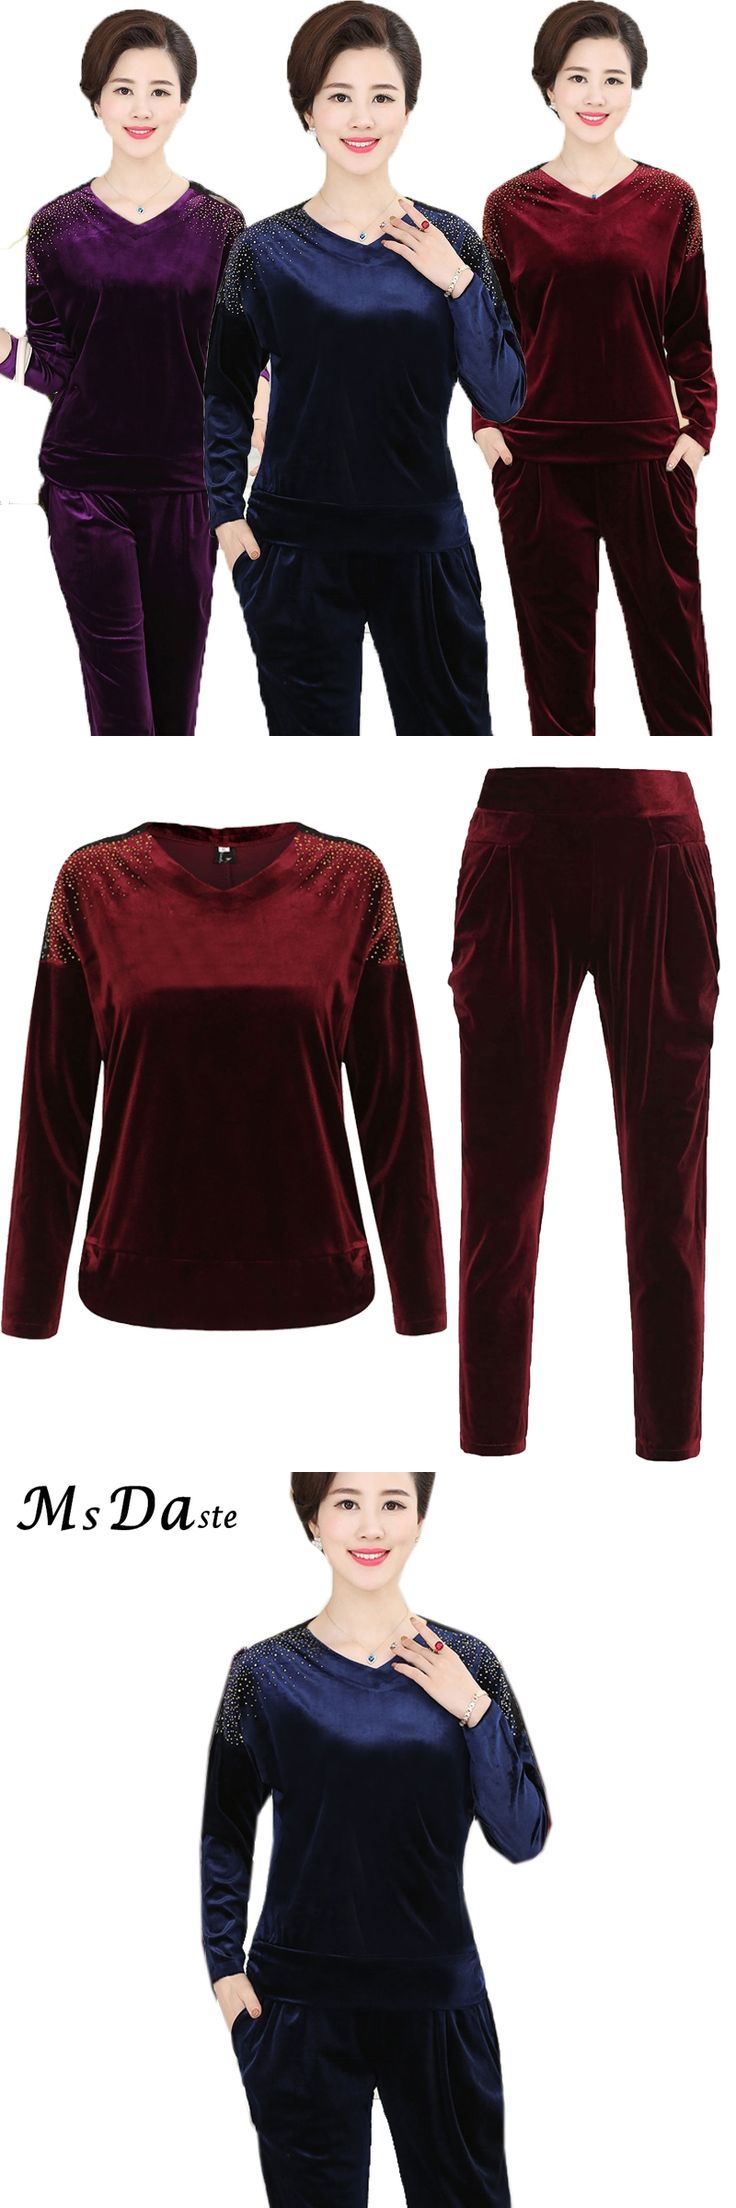 2017 Women Clothing Two Piece Set: hoody+pants Stretchy Lady Tracksuit Velvet Conjunto Feminino Blue Red Purple Plus Size XL~4XL